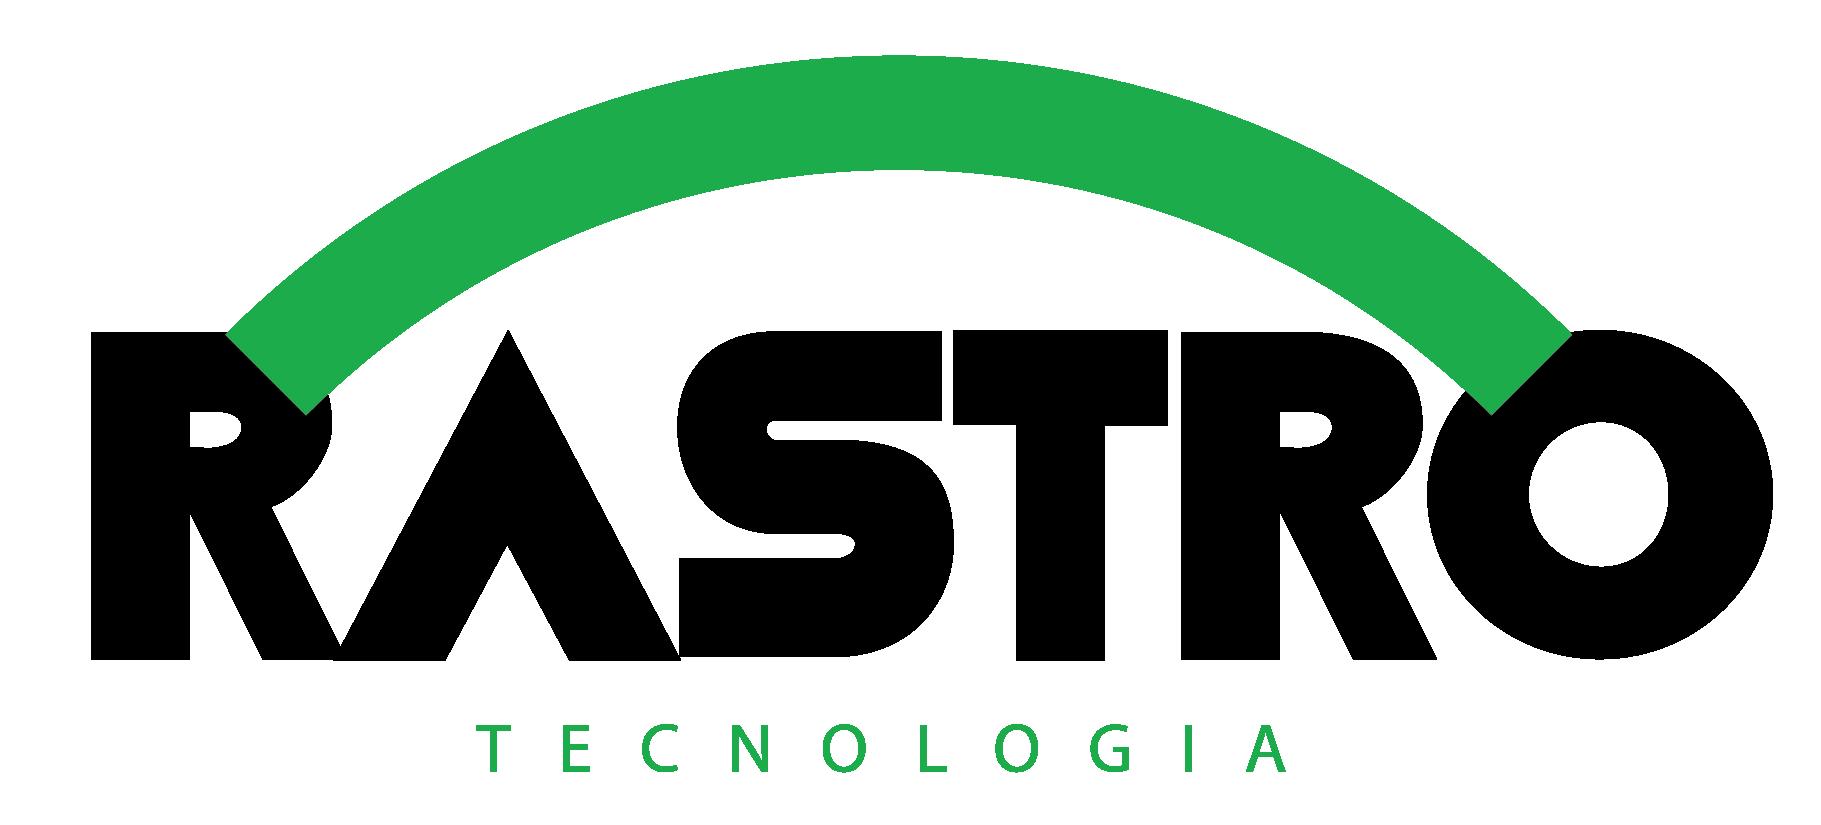 Rastro Tecnologia